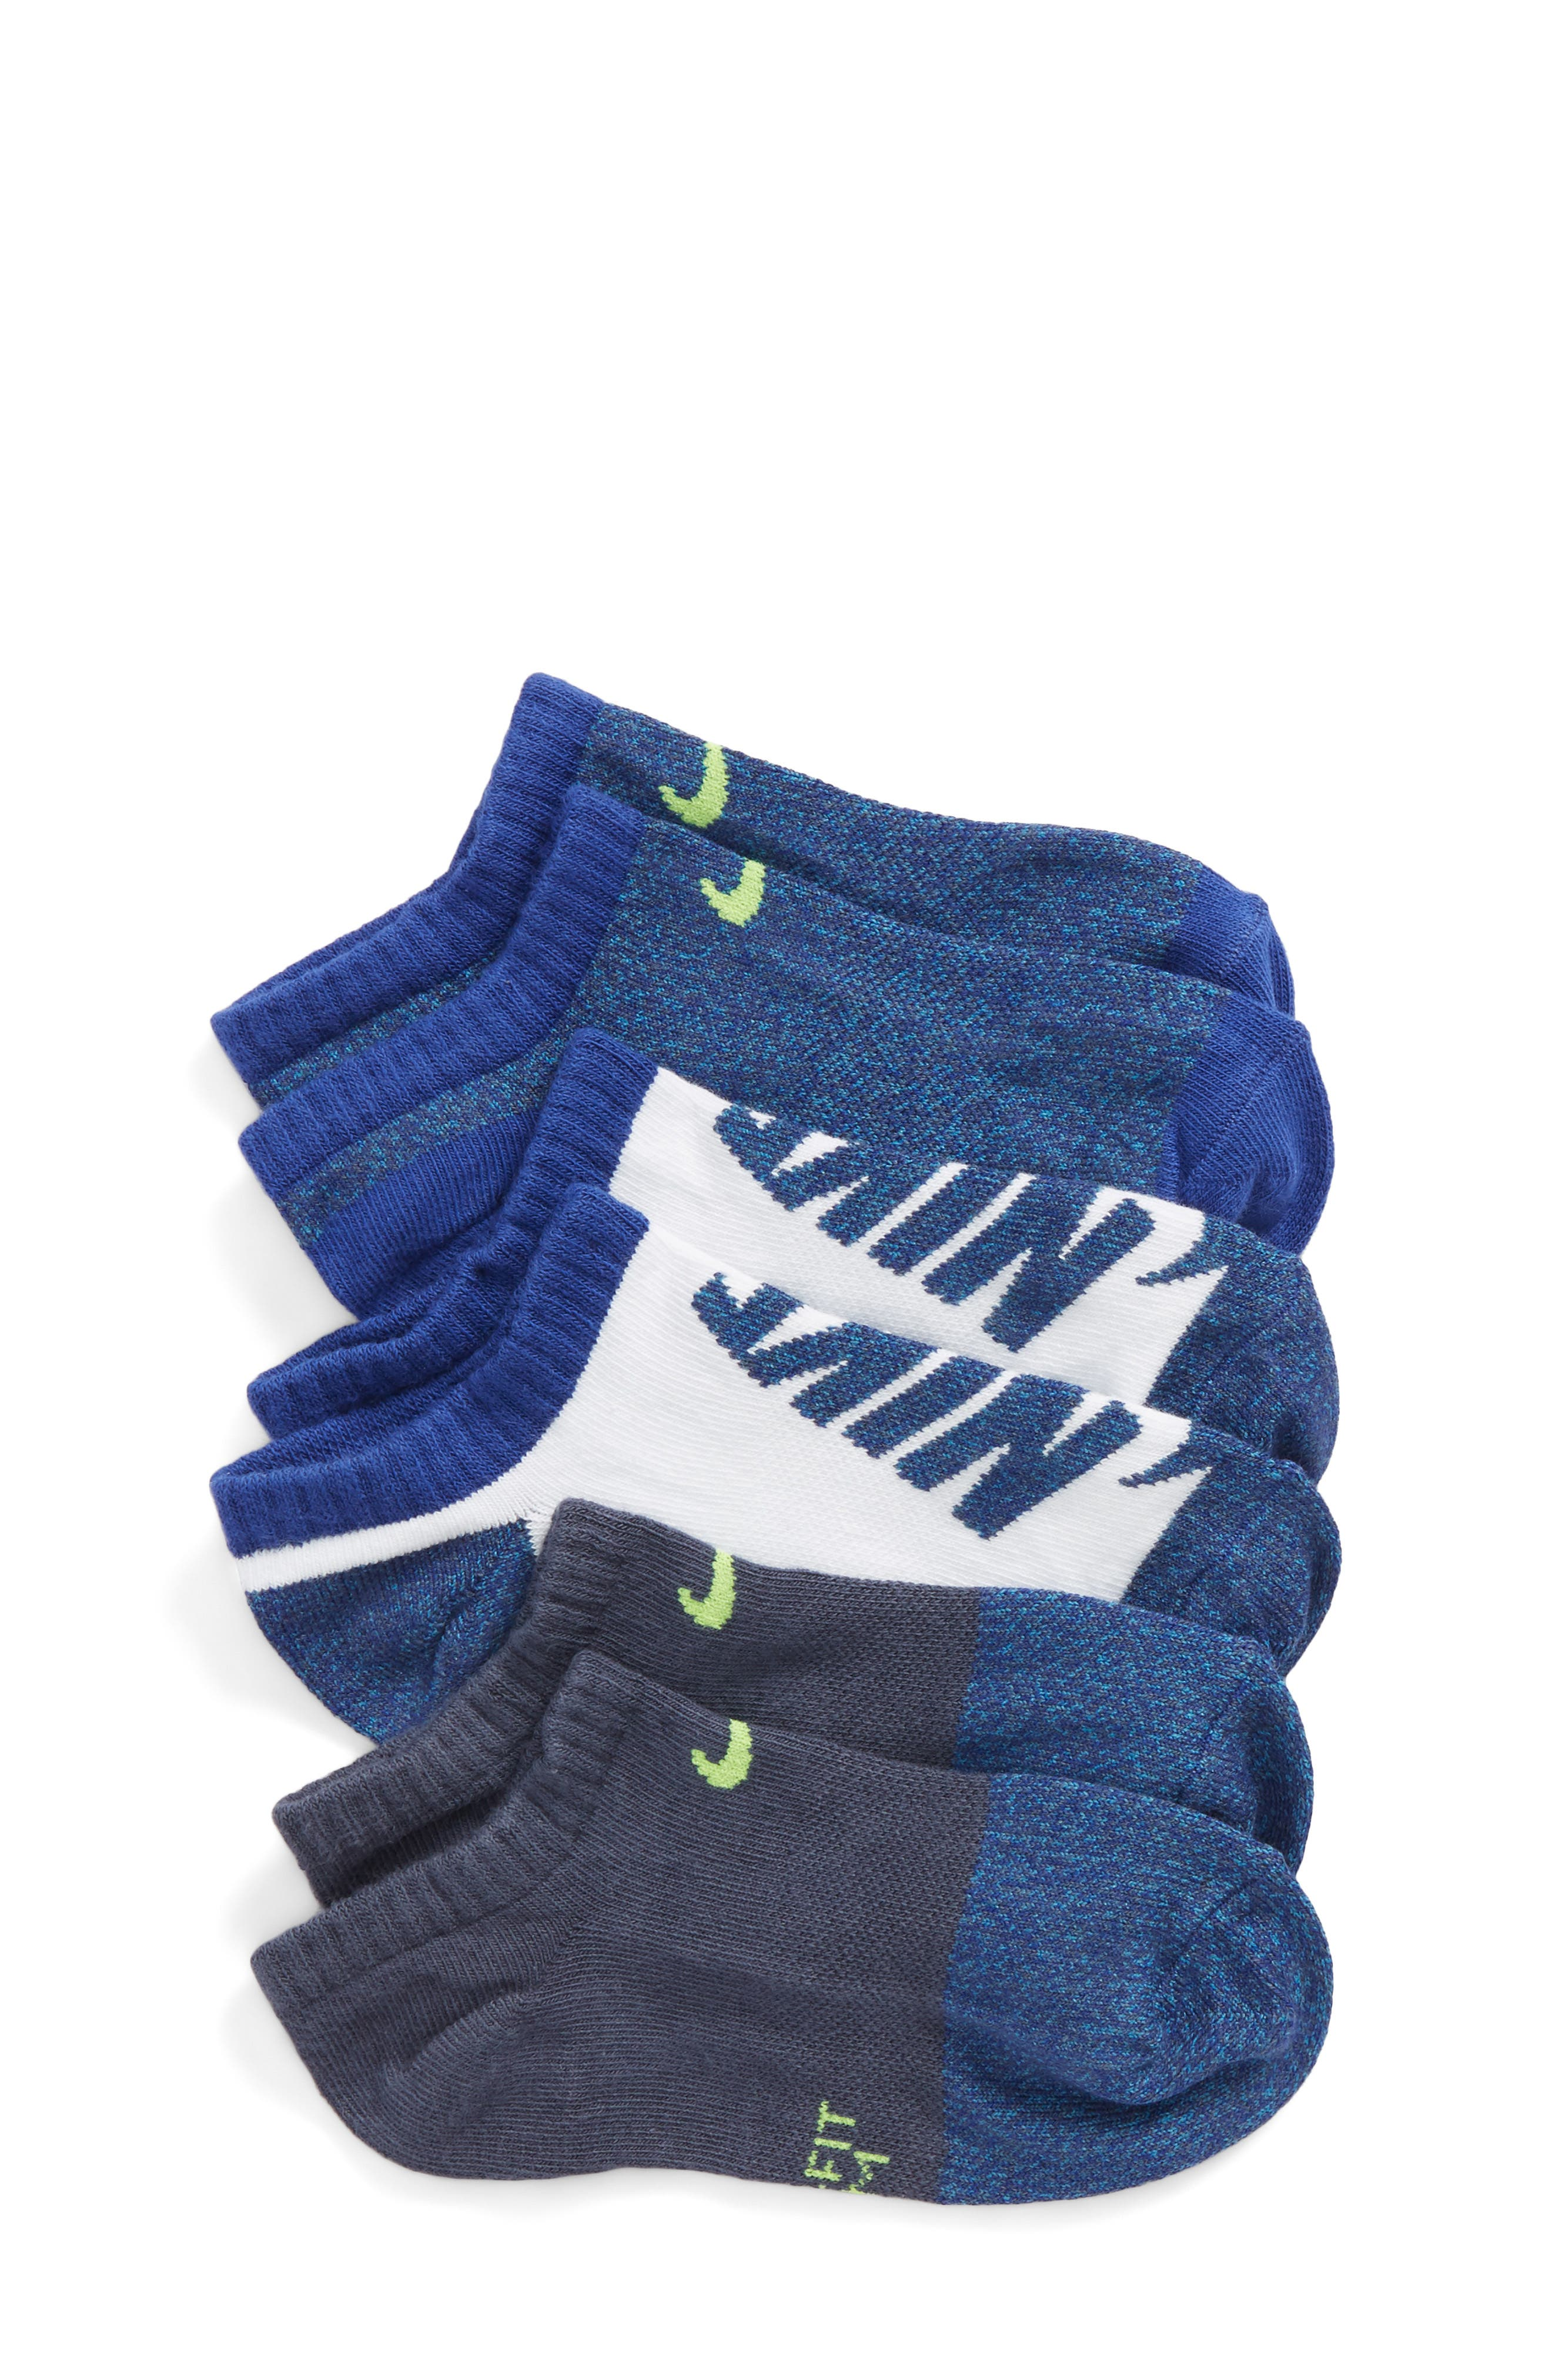 Kids Socks Nike Shoes & Clothes